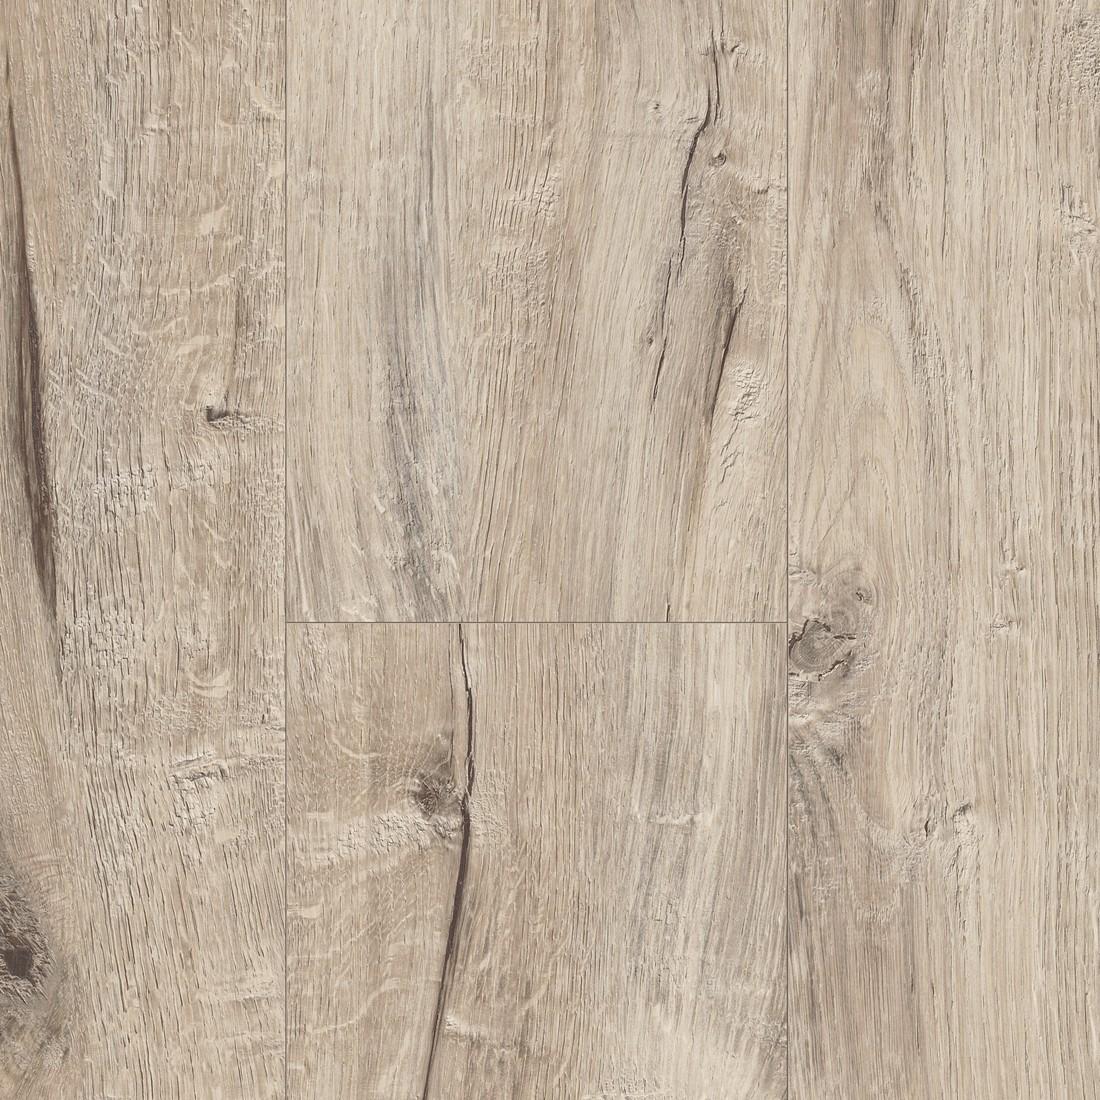 PARADOR Laminat Trendtime 1 Eiche Century geseift Vintagestruktur 4-V-Fuge Stabdiele Artikel-Ne.: 1473910 – Bild 2